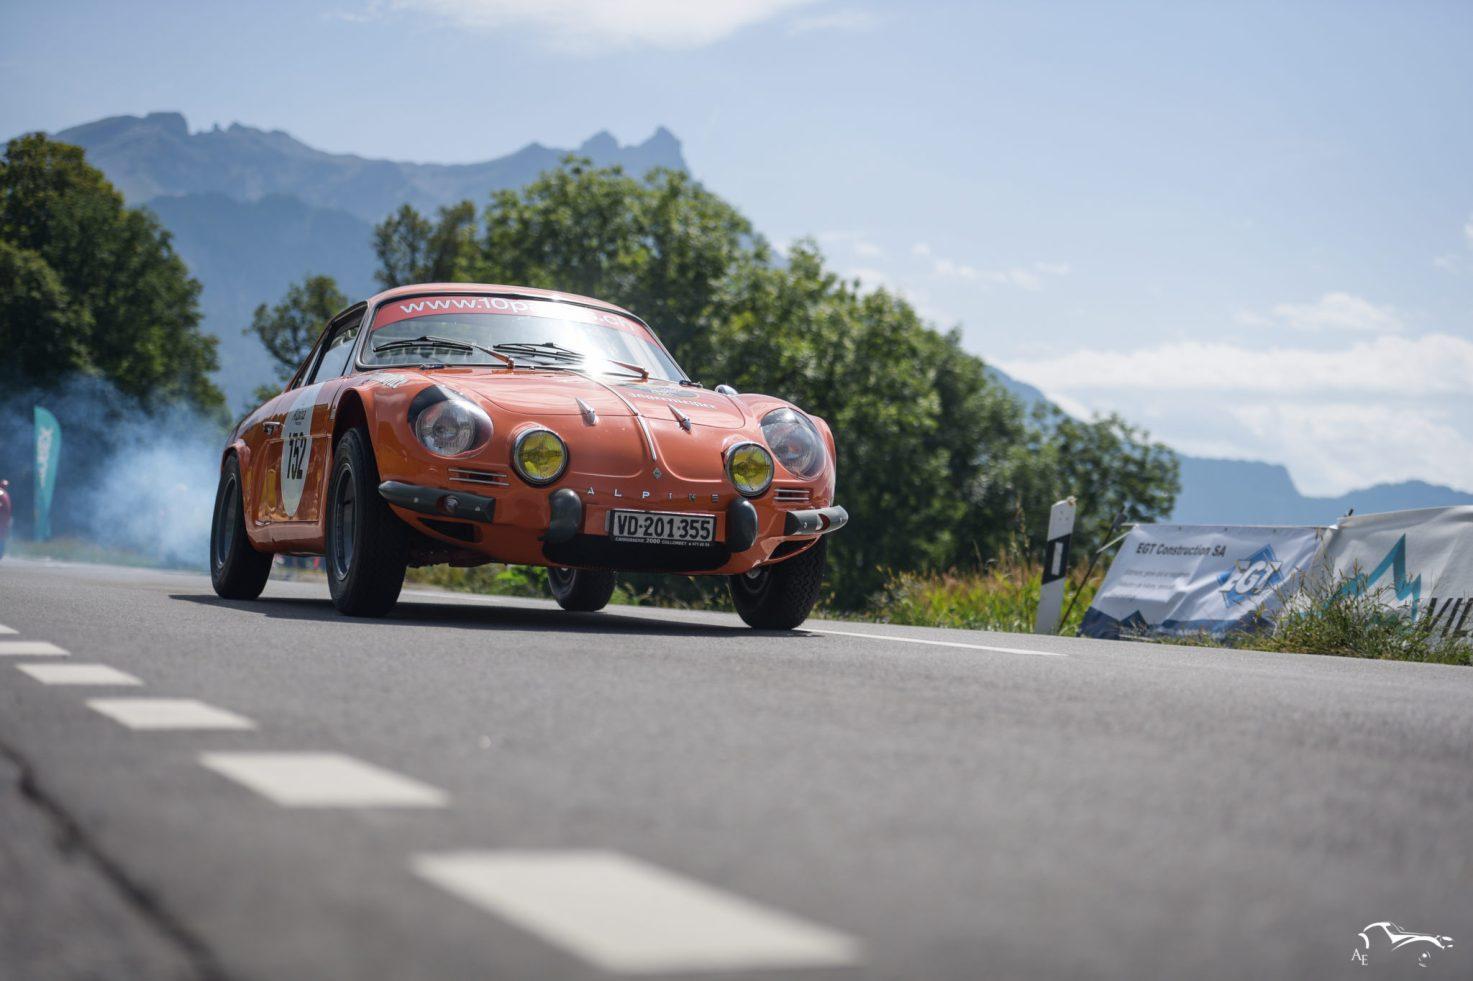 Alpine Renault A110 1296 cc 1968